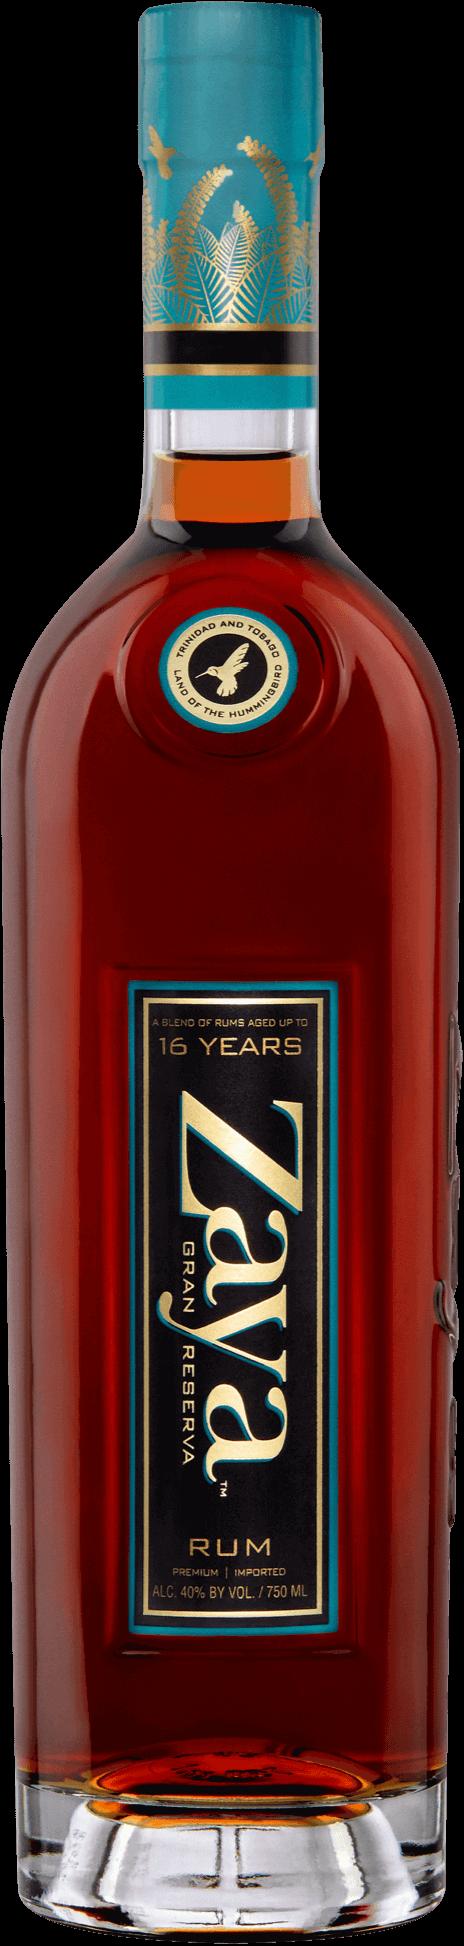 zaya gran reserva rum bottle